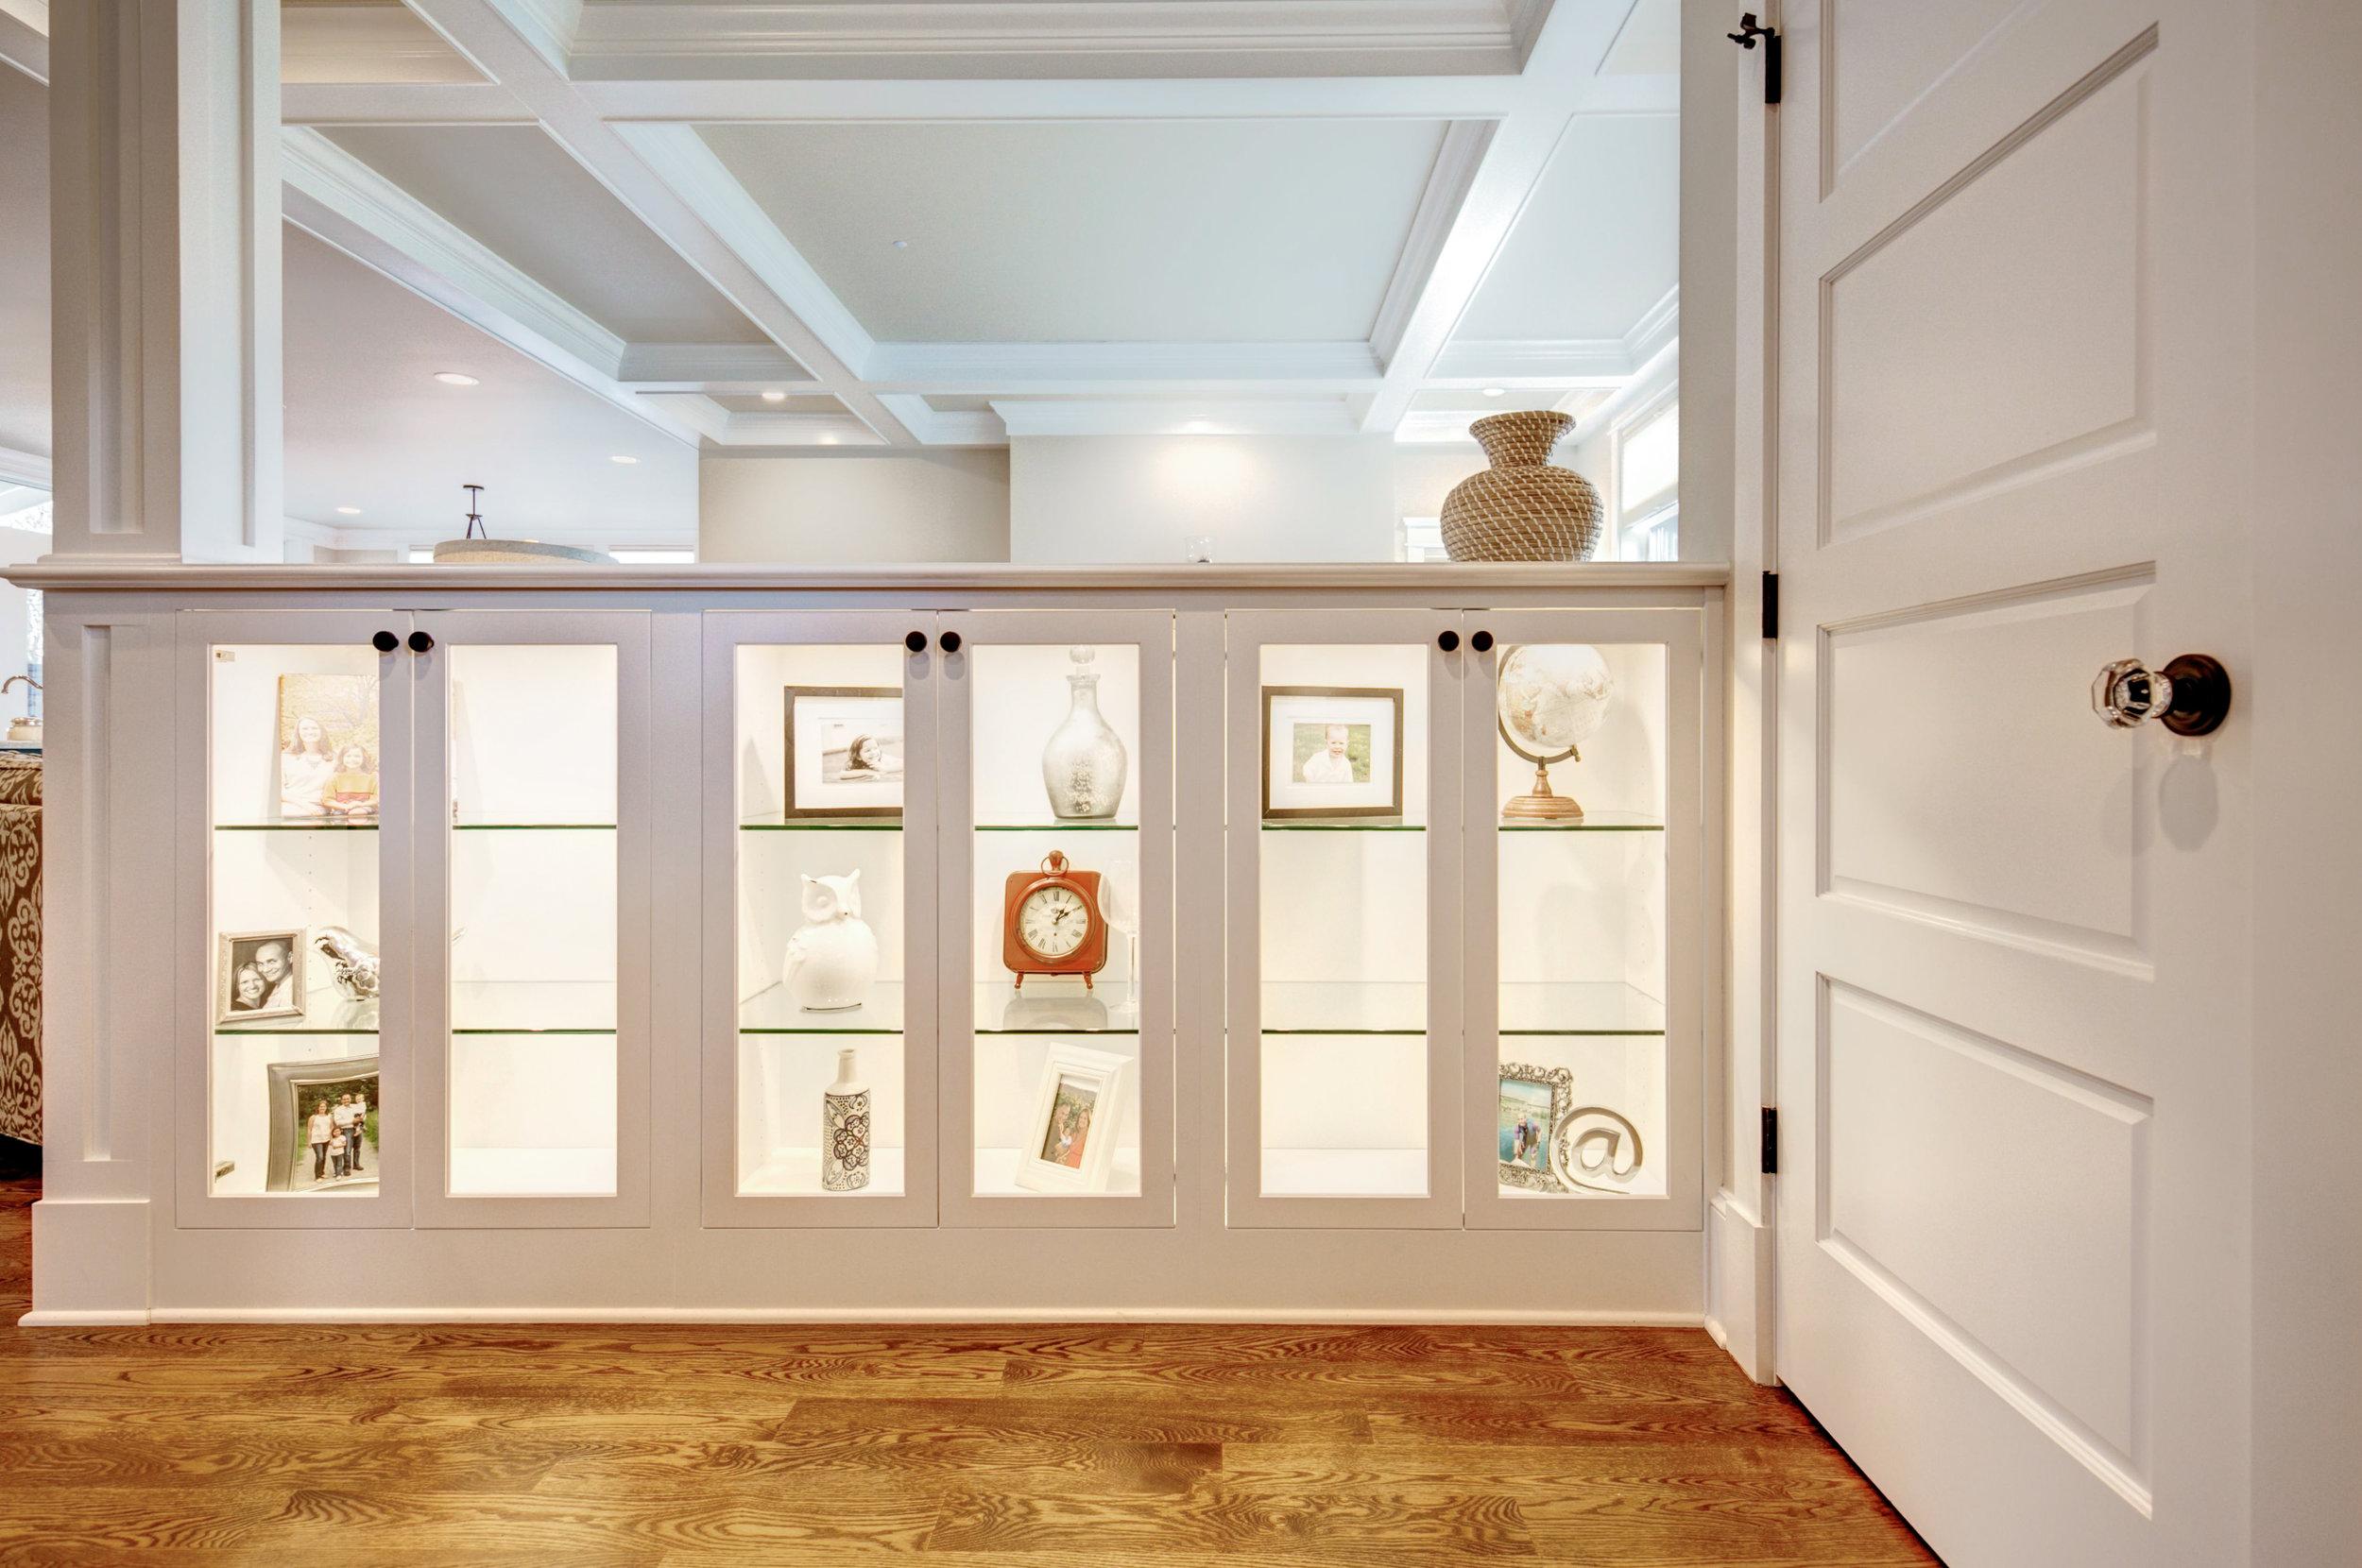 mandy callaway interiors-greenlake house-00006.jpg